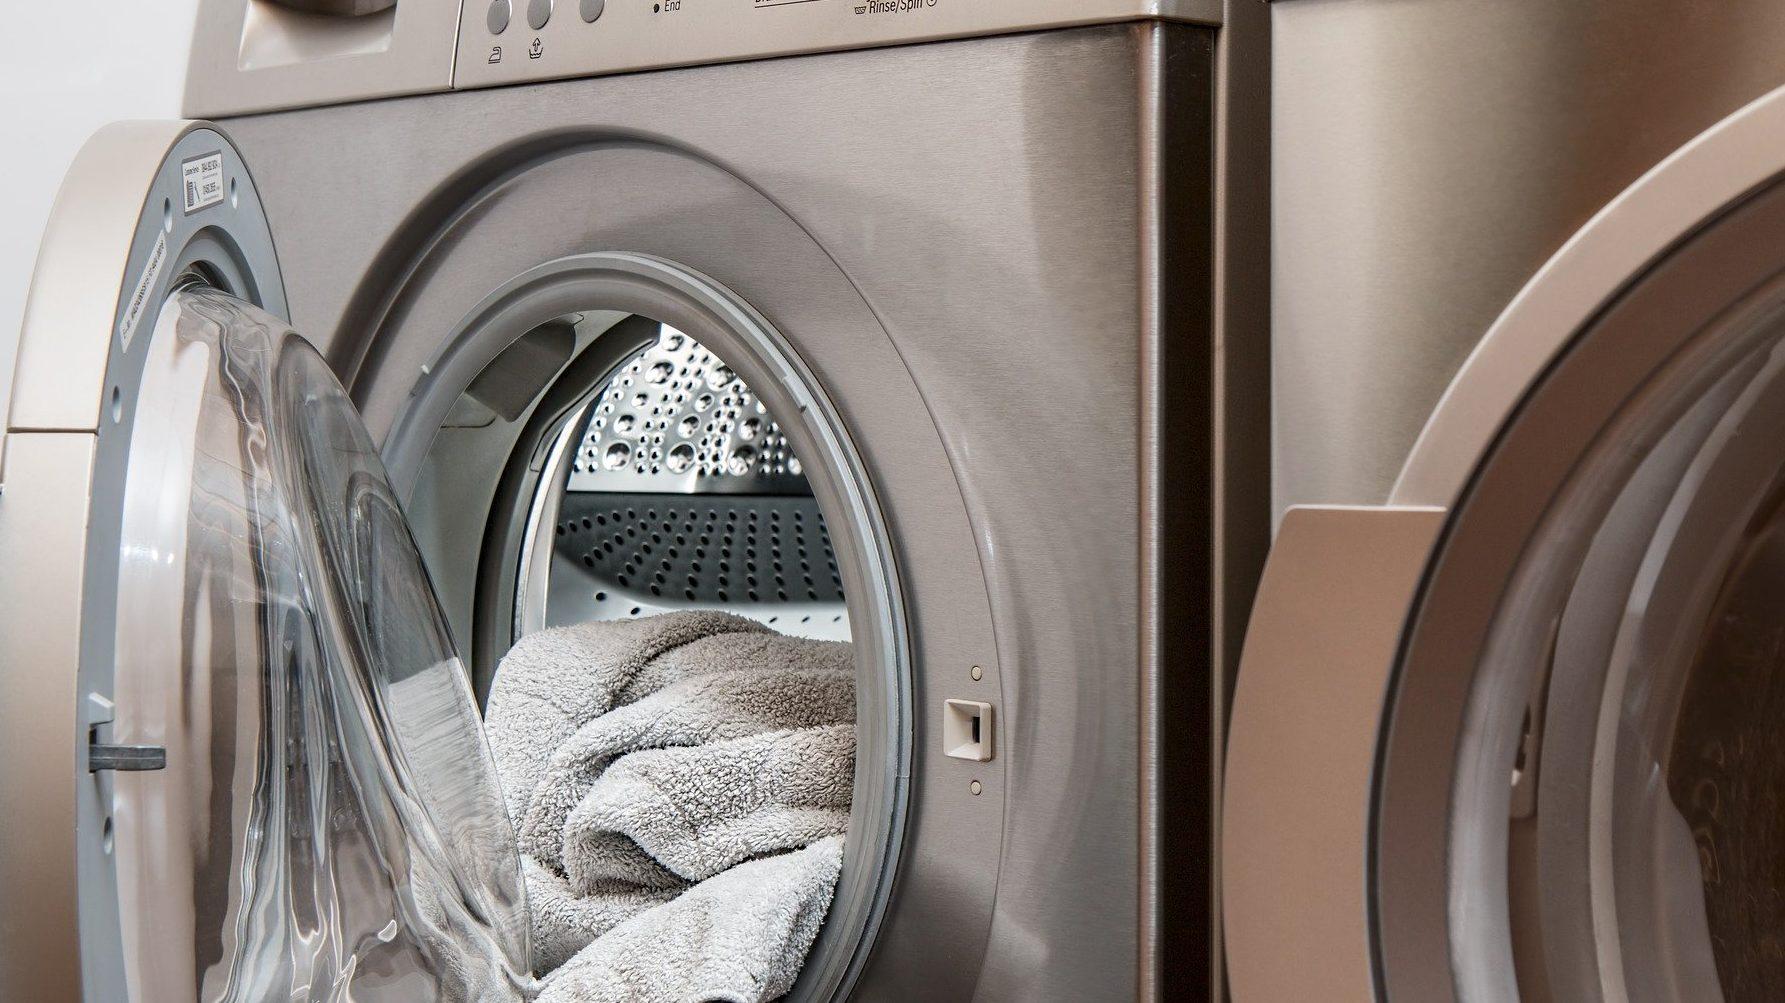 Whirlpool עושה ריקול ל-500 אלף מכונות כביסה